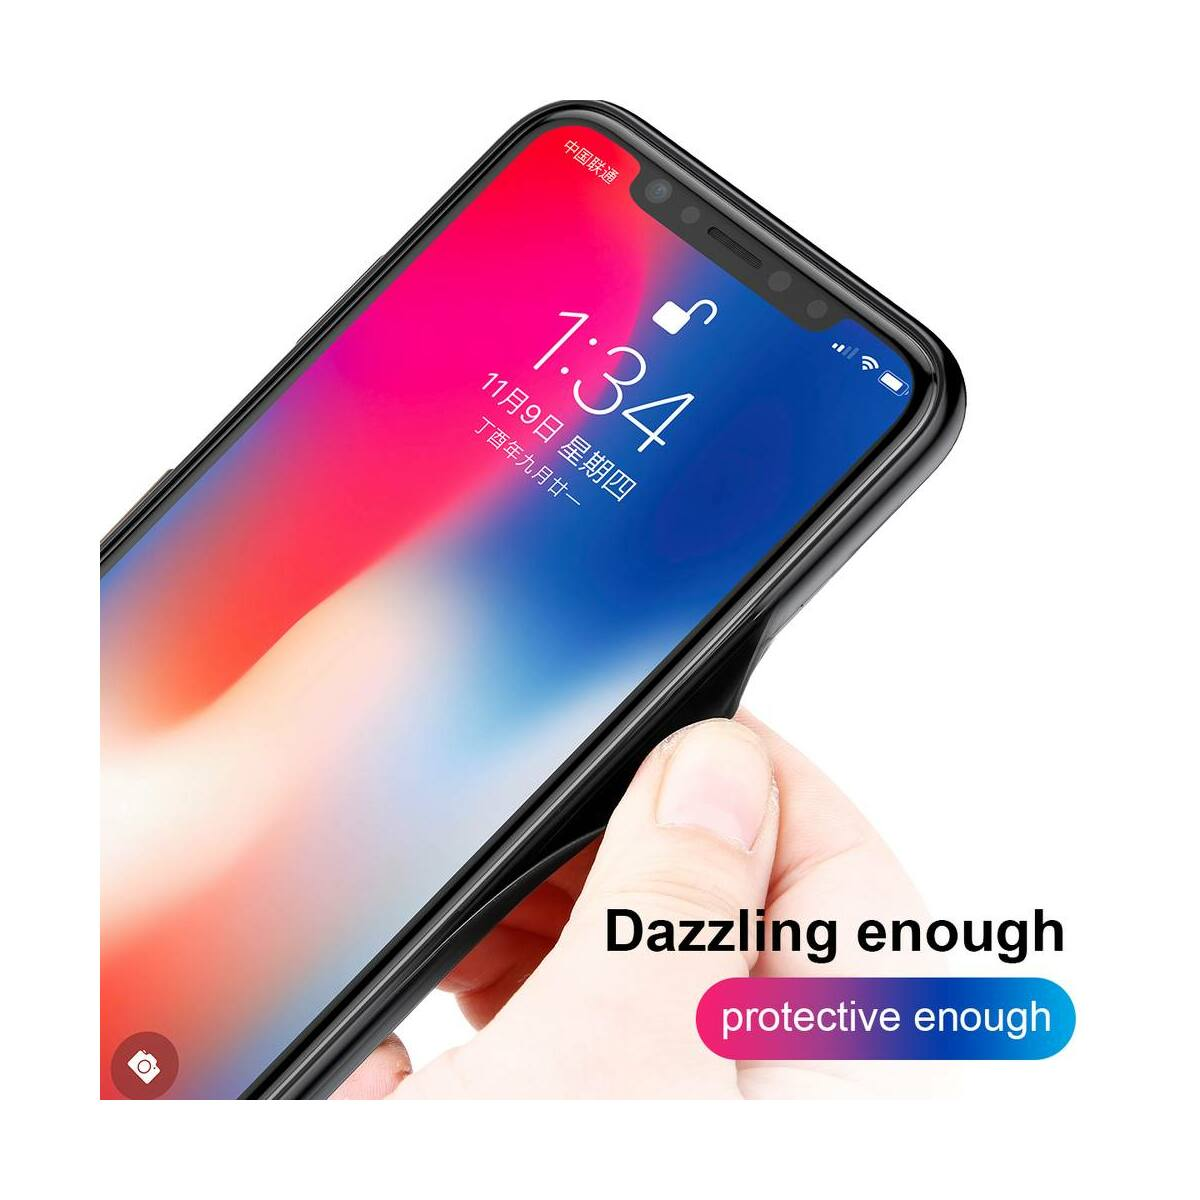 Baseus iPhone X/XS tok, Laser Luster, kék/piros (WIAPIPHX-XC39)